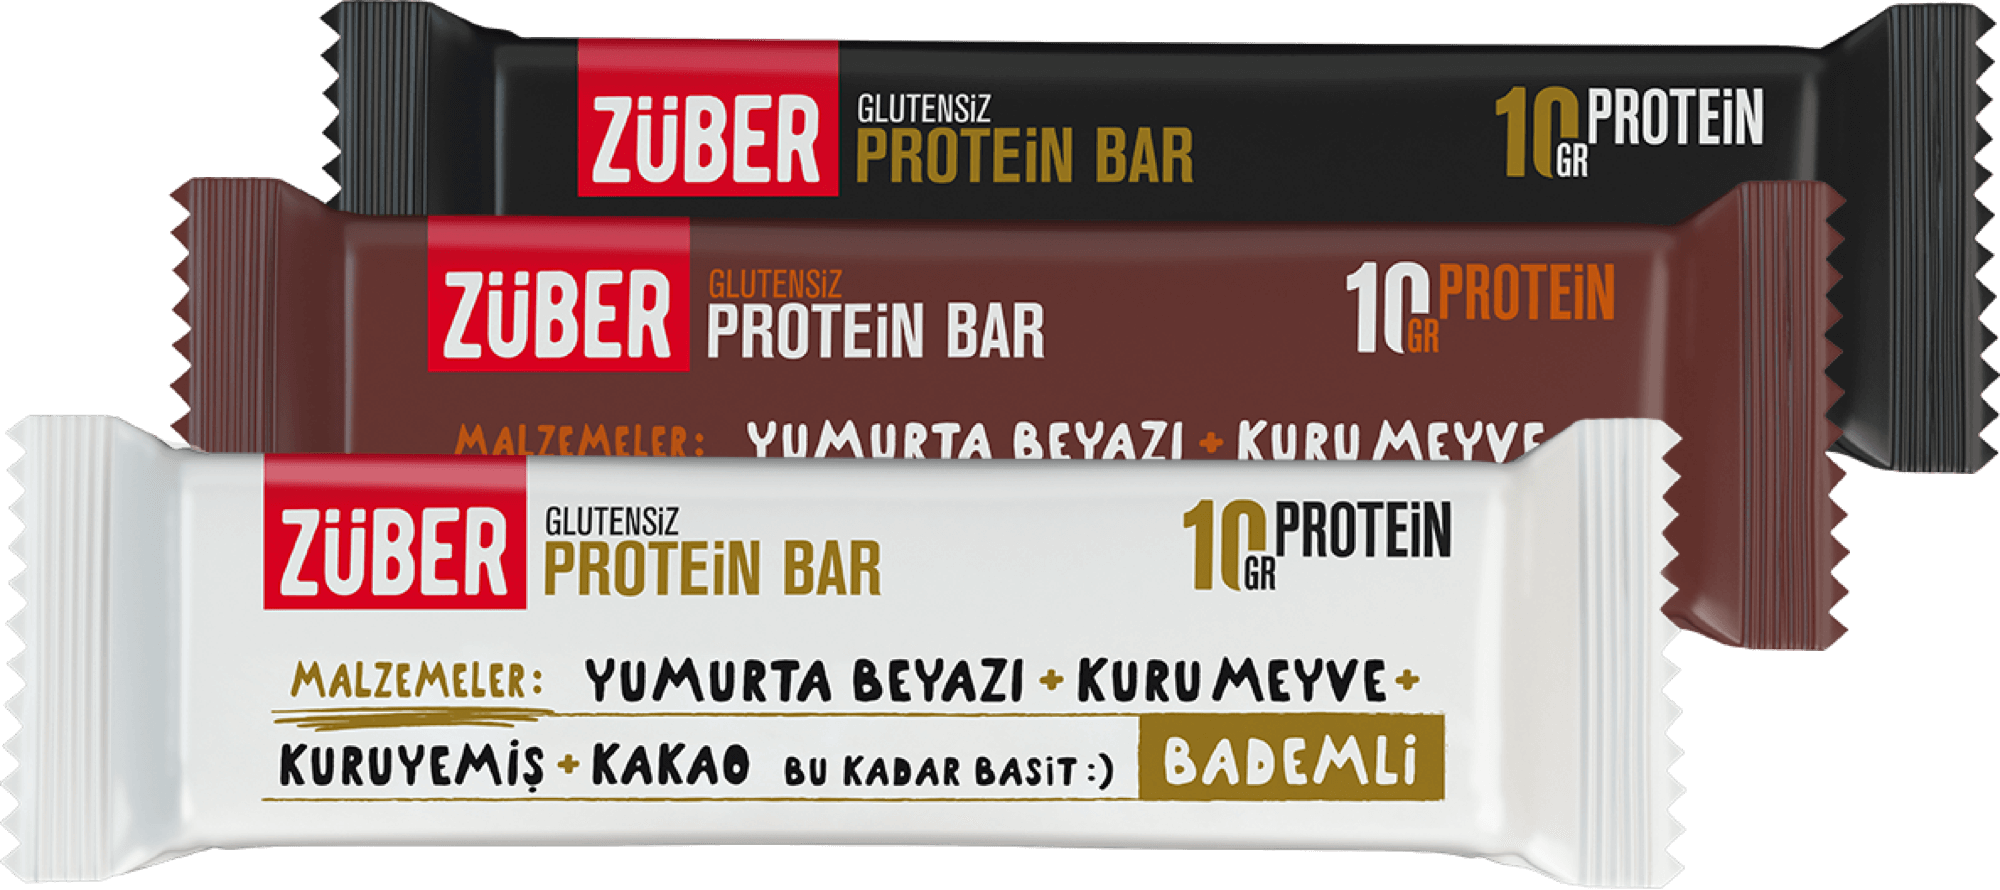 Züber Protein Bar glutensiz, doğal protein kaynağı